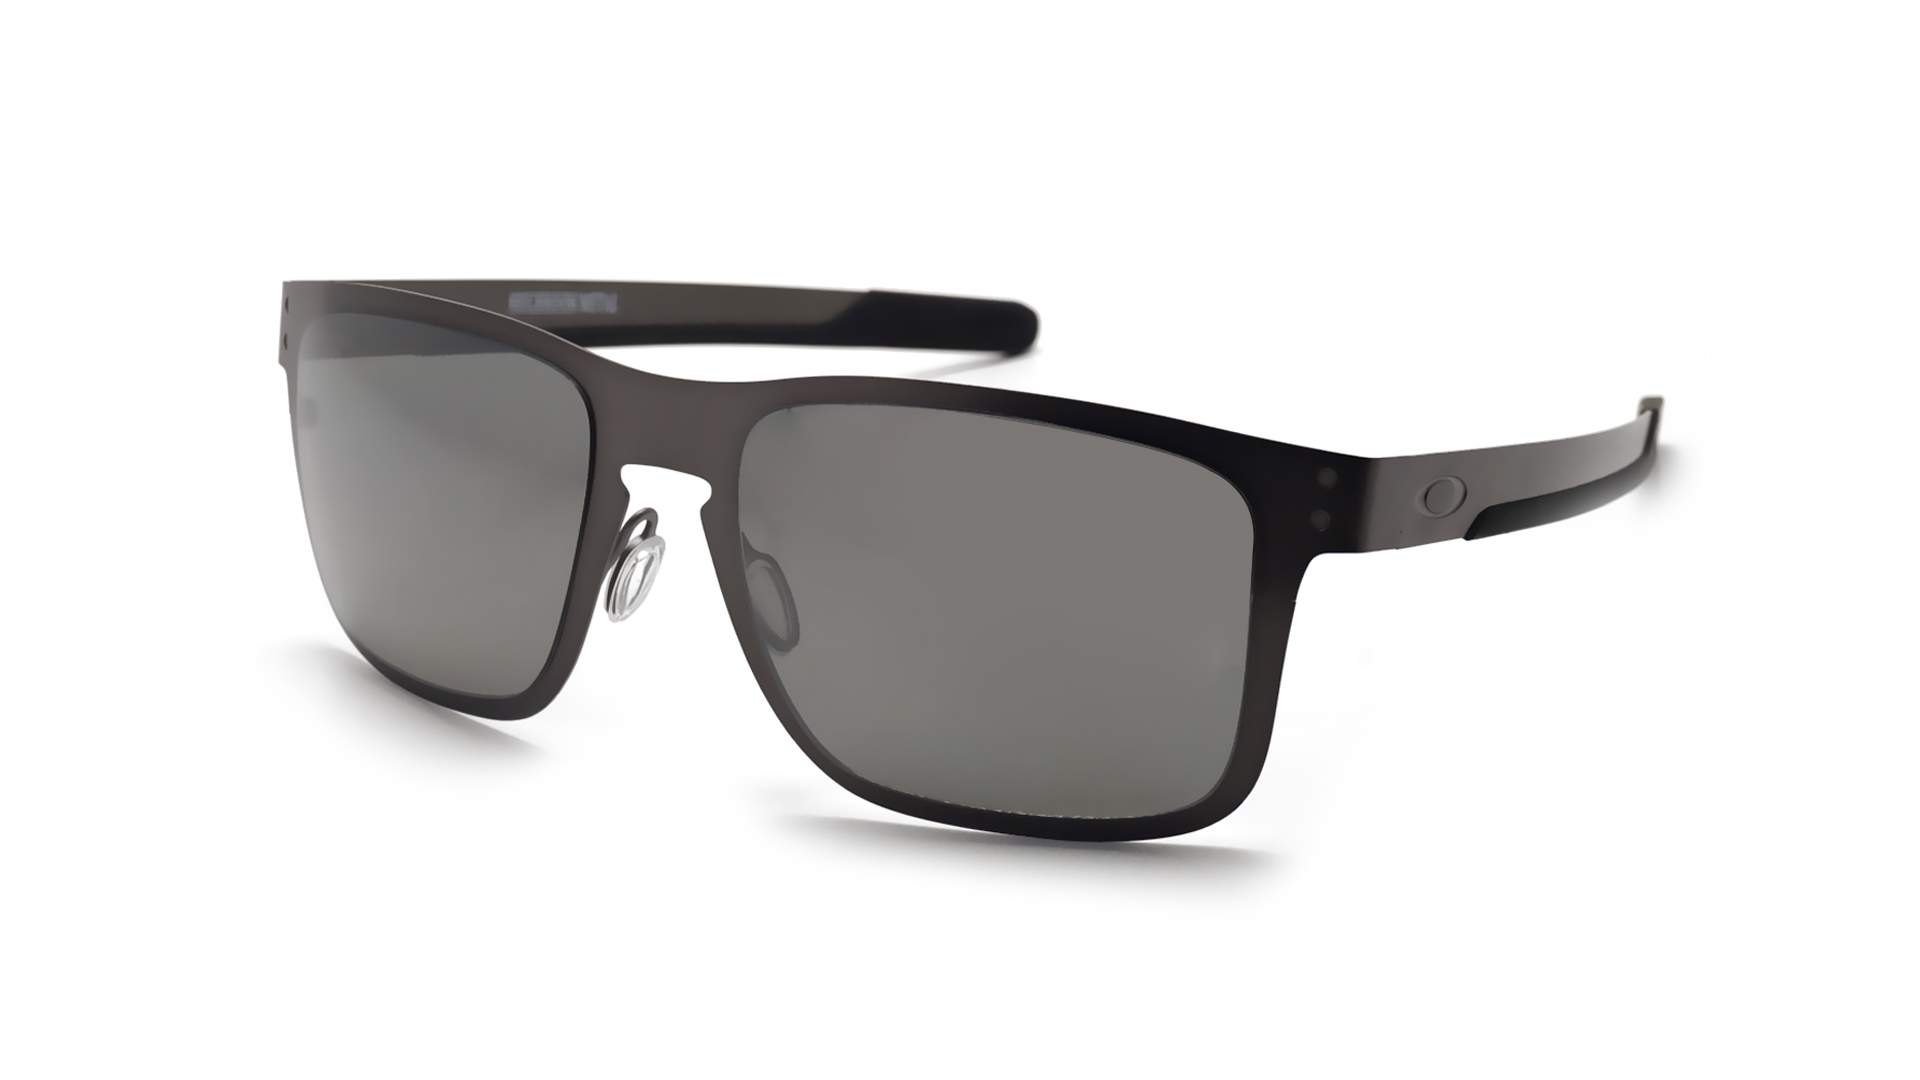 d101392c51e Sunglasses Oakley Holbrook Metal Grey Matte Prizm OO4123 06 55-18 Medium  Polarized Mirror